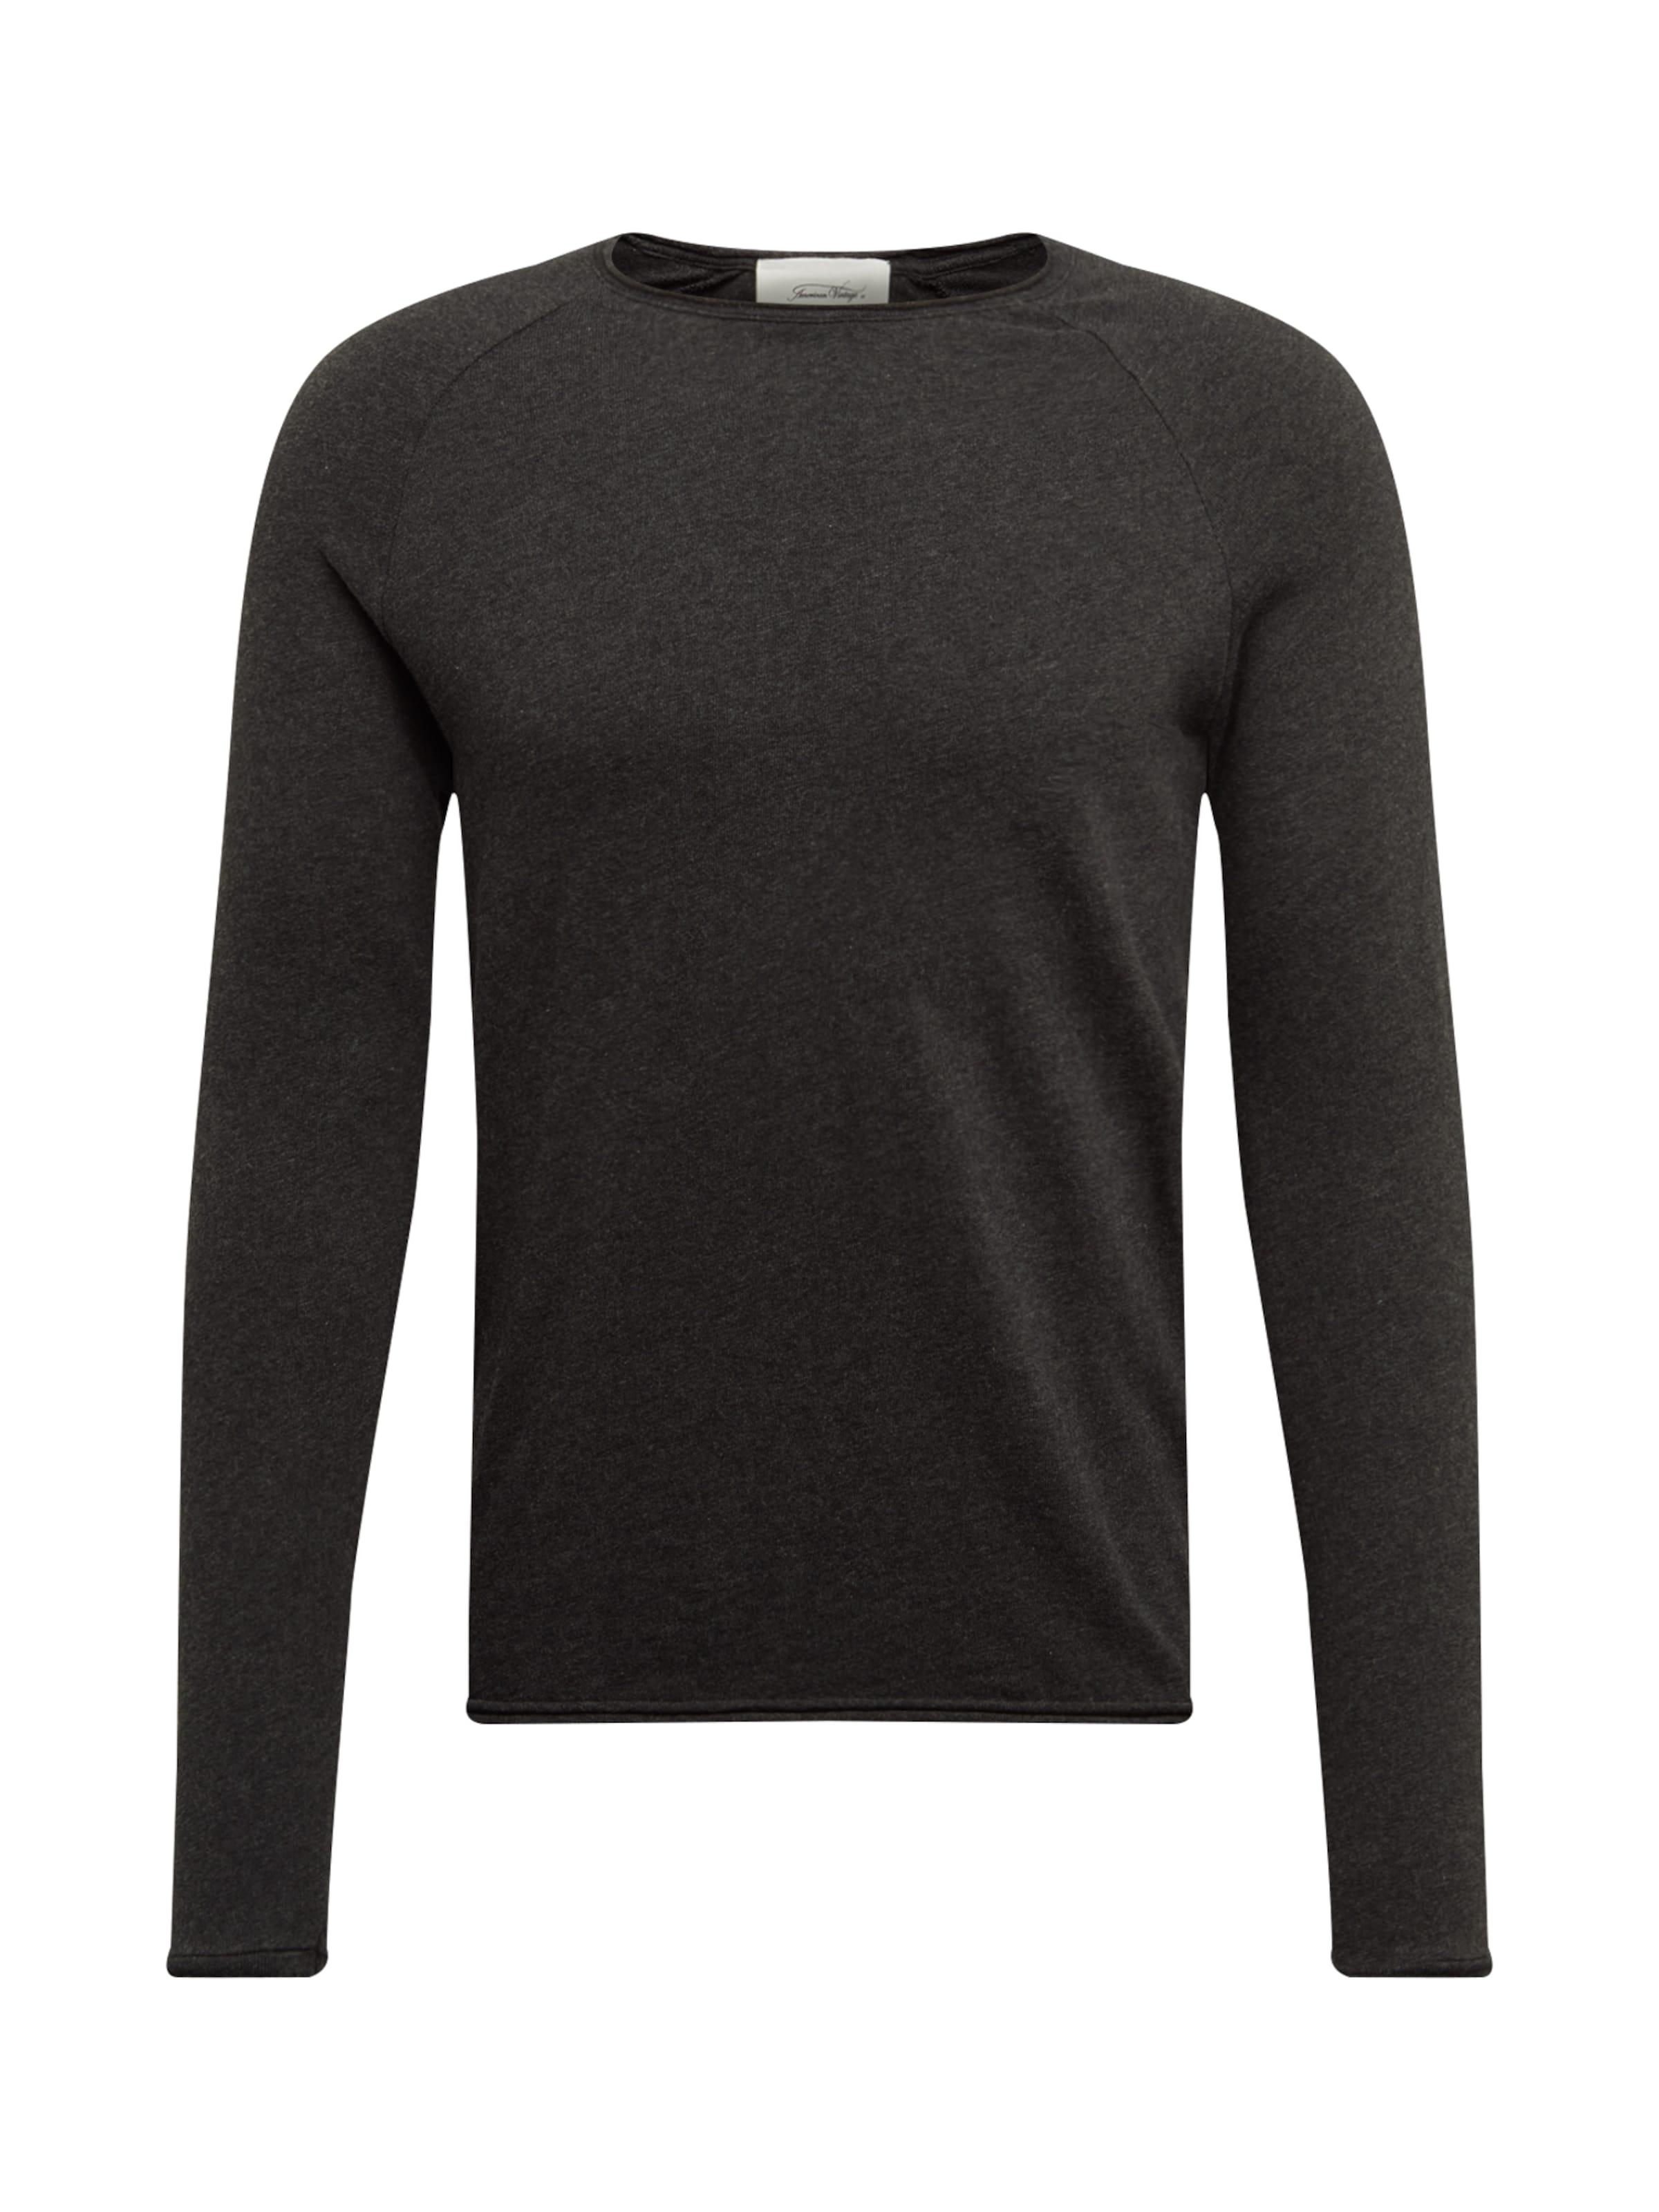 'sonoma' In Dunkelgrau American Shirts Vintage cK1TFlJ